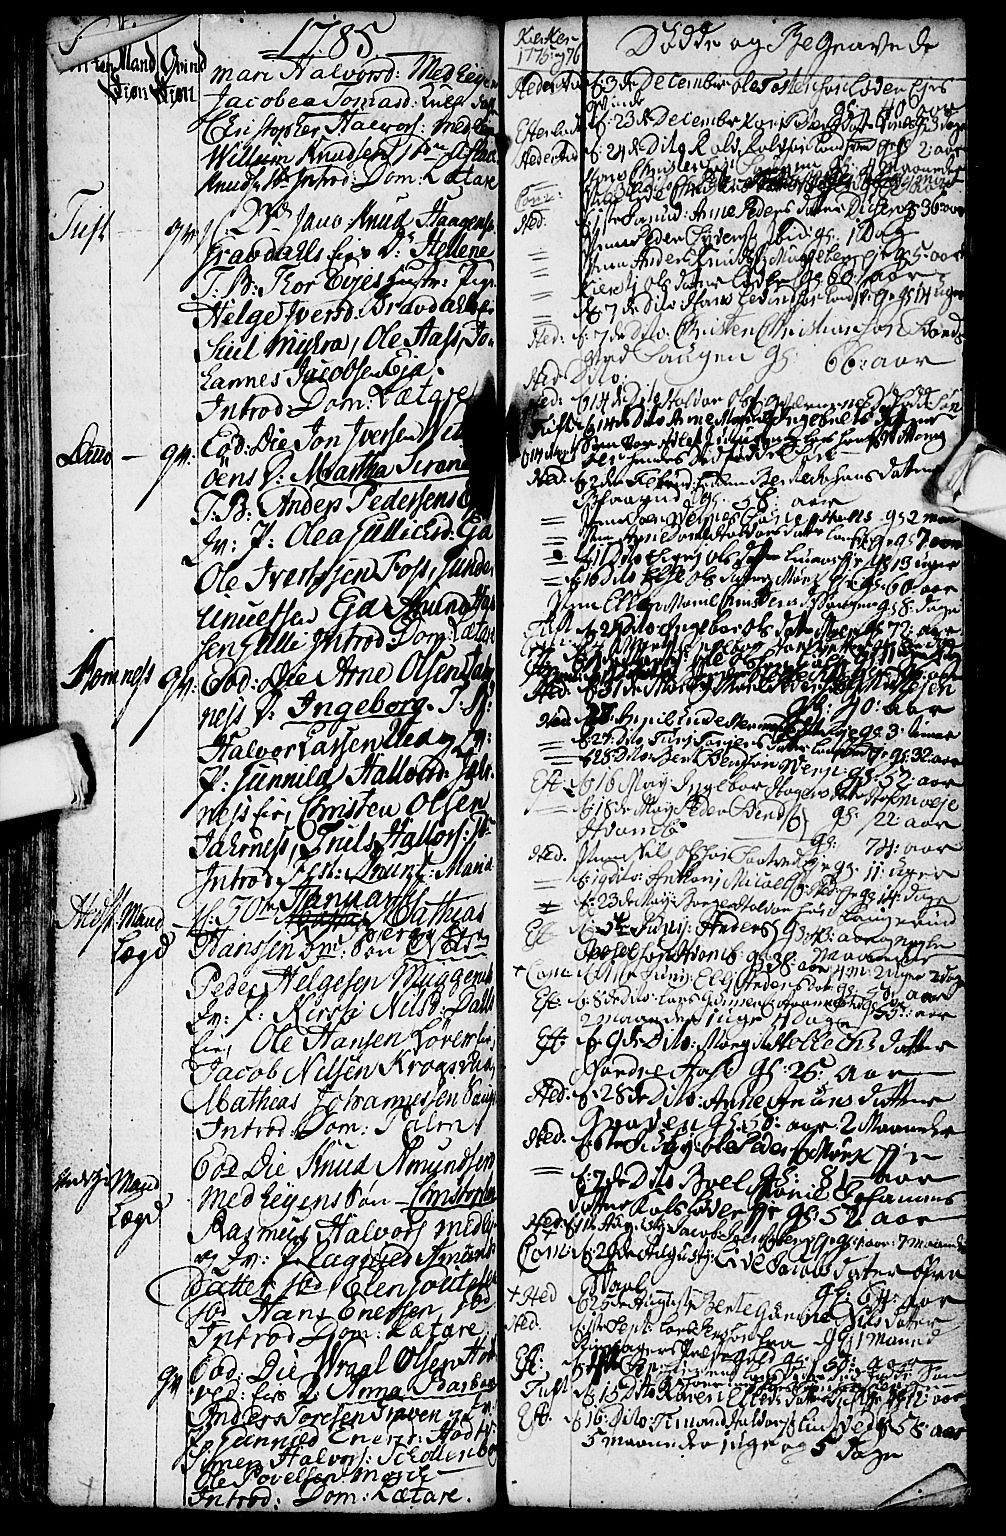 SAKO, Sandsvær kirkebøker, G/Ga/L0001: Klokkerbok nr. I 1, 1775-1786